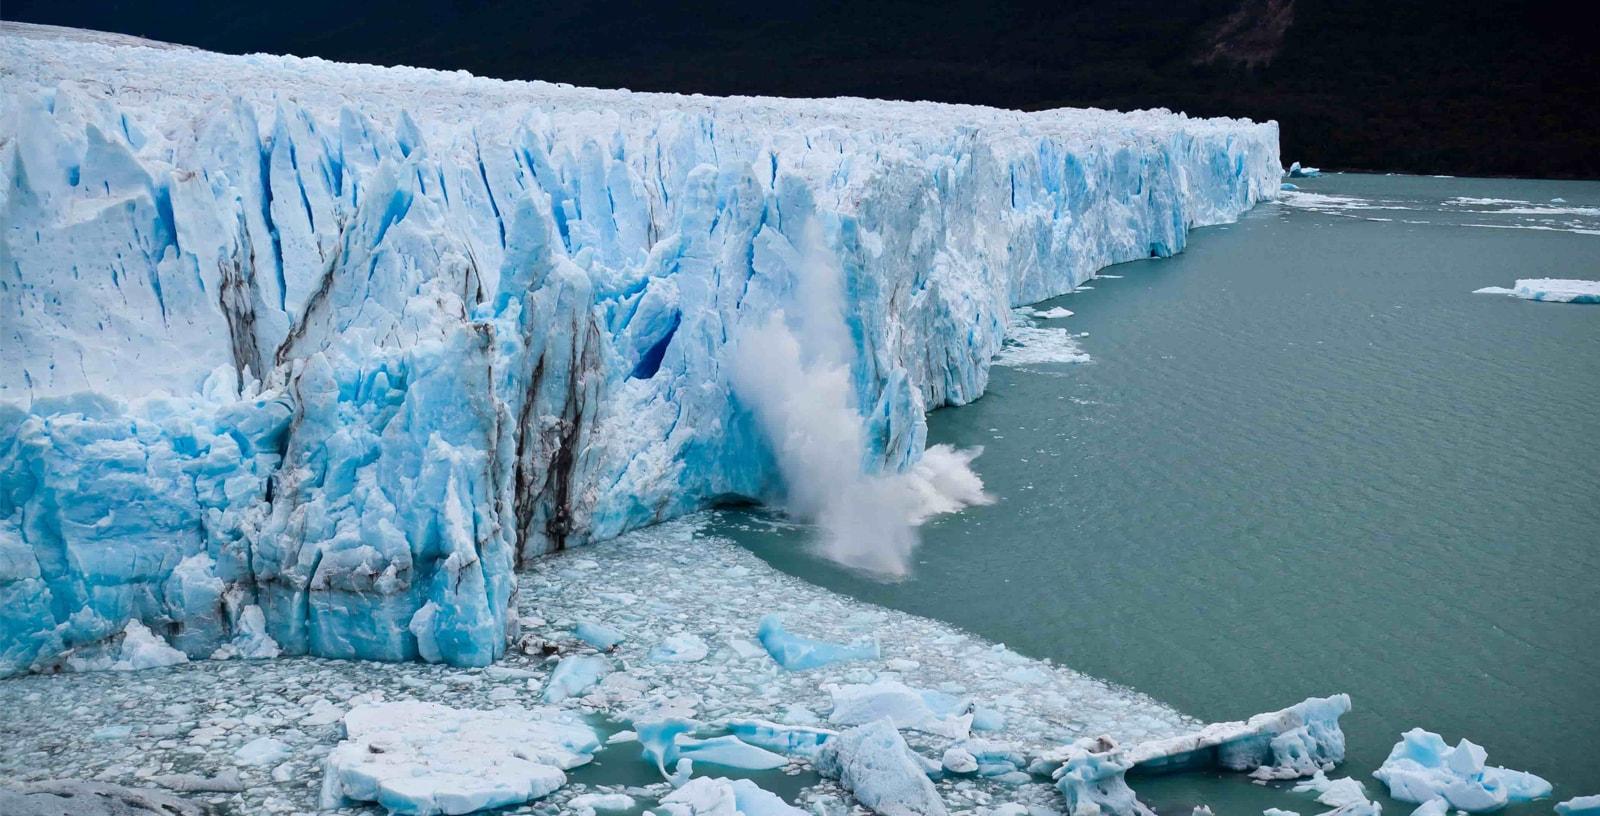 Glaciar_Perito_Moreno_IDOM_Consultoria_Propiedad